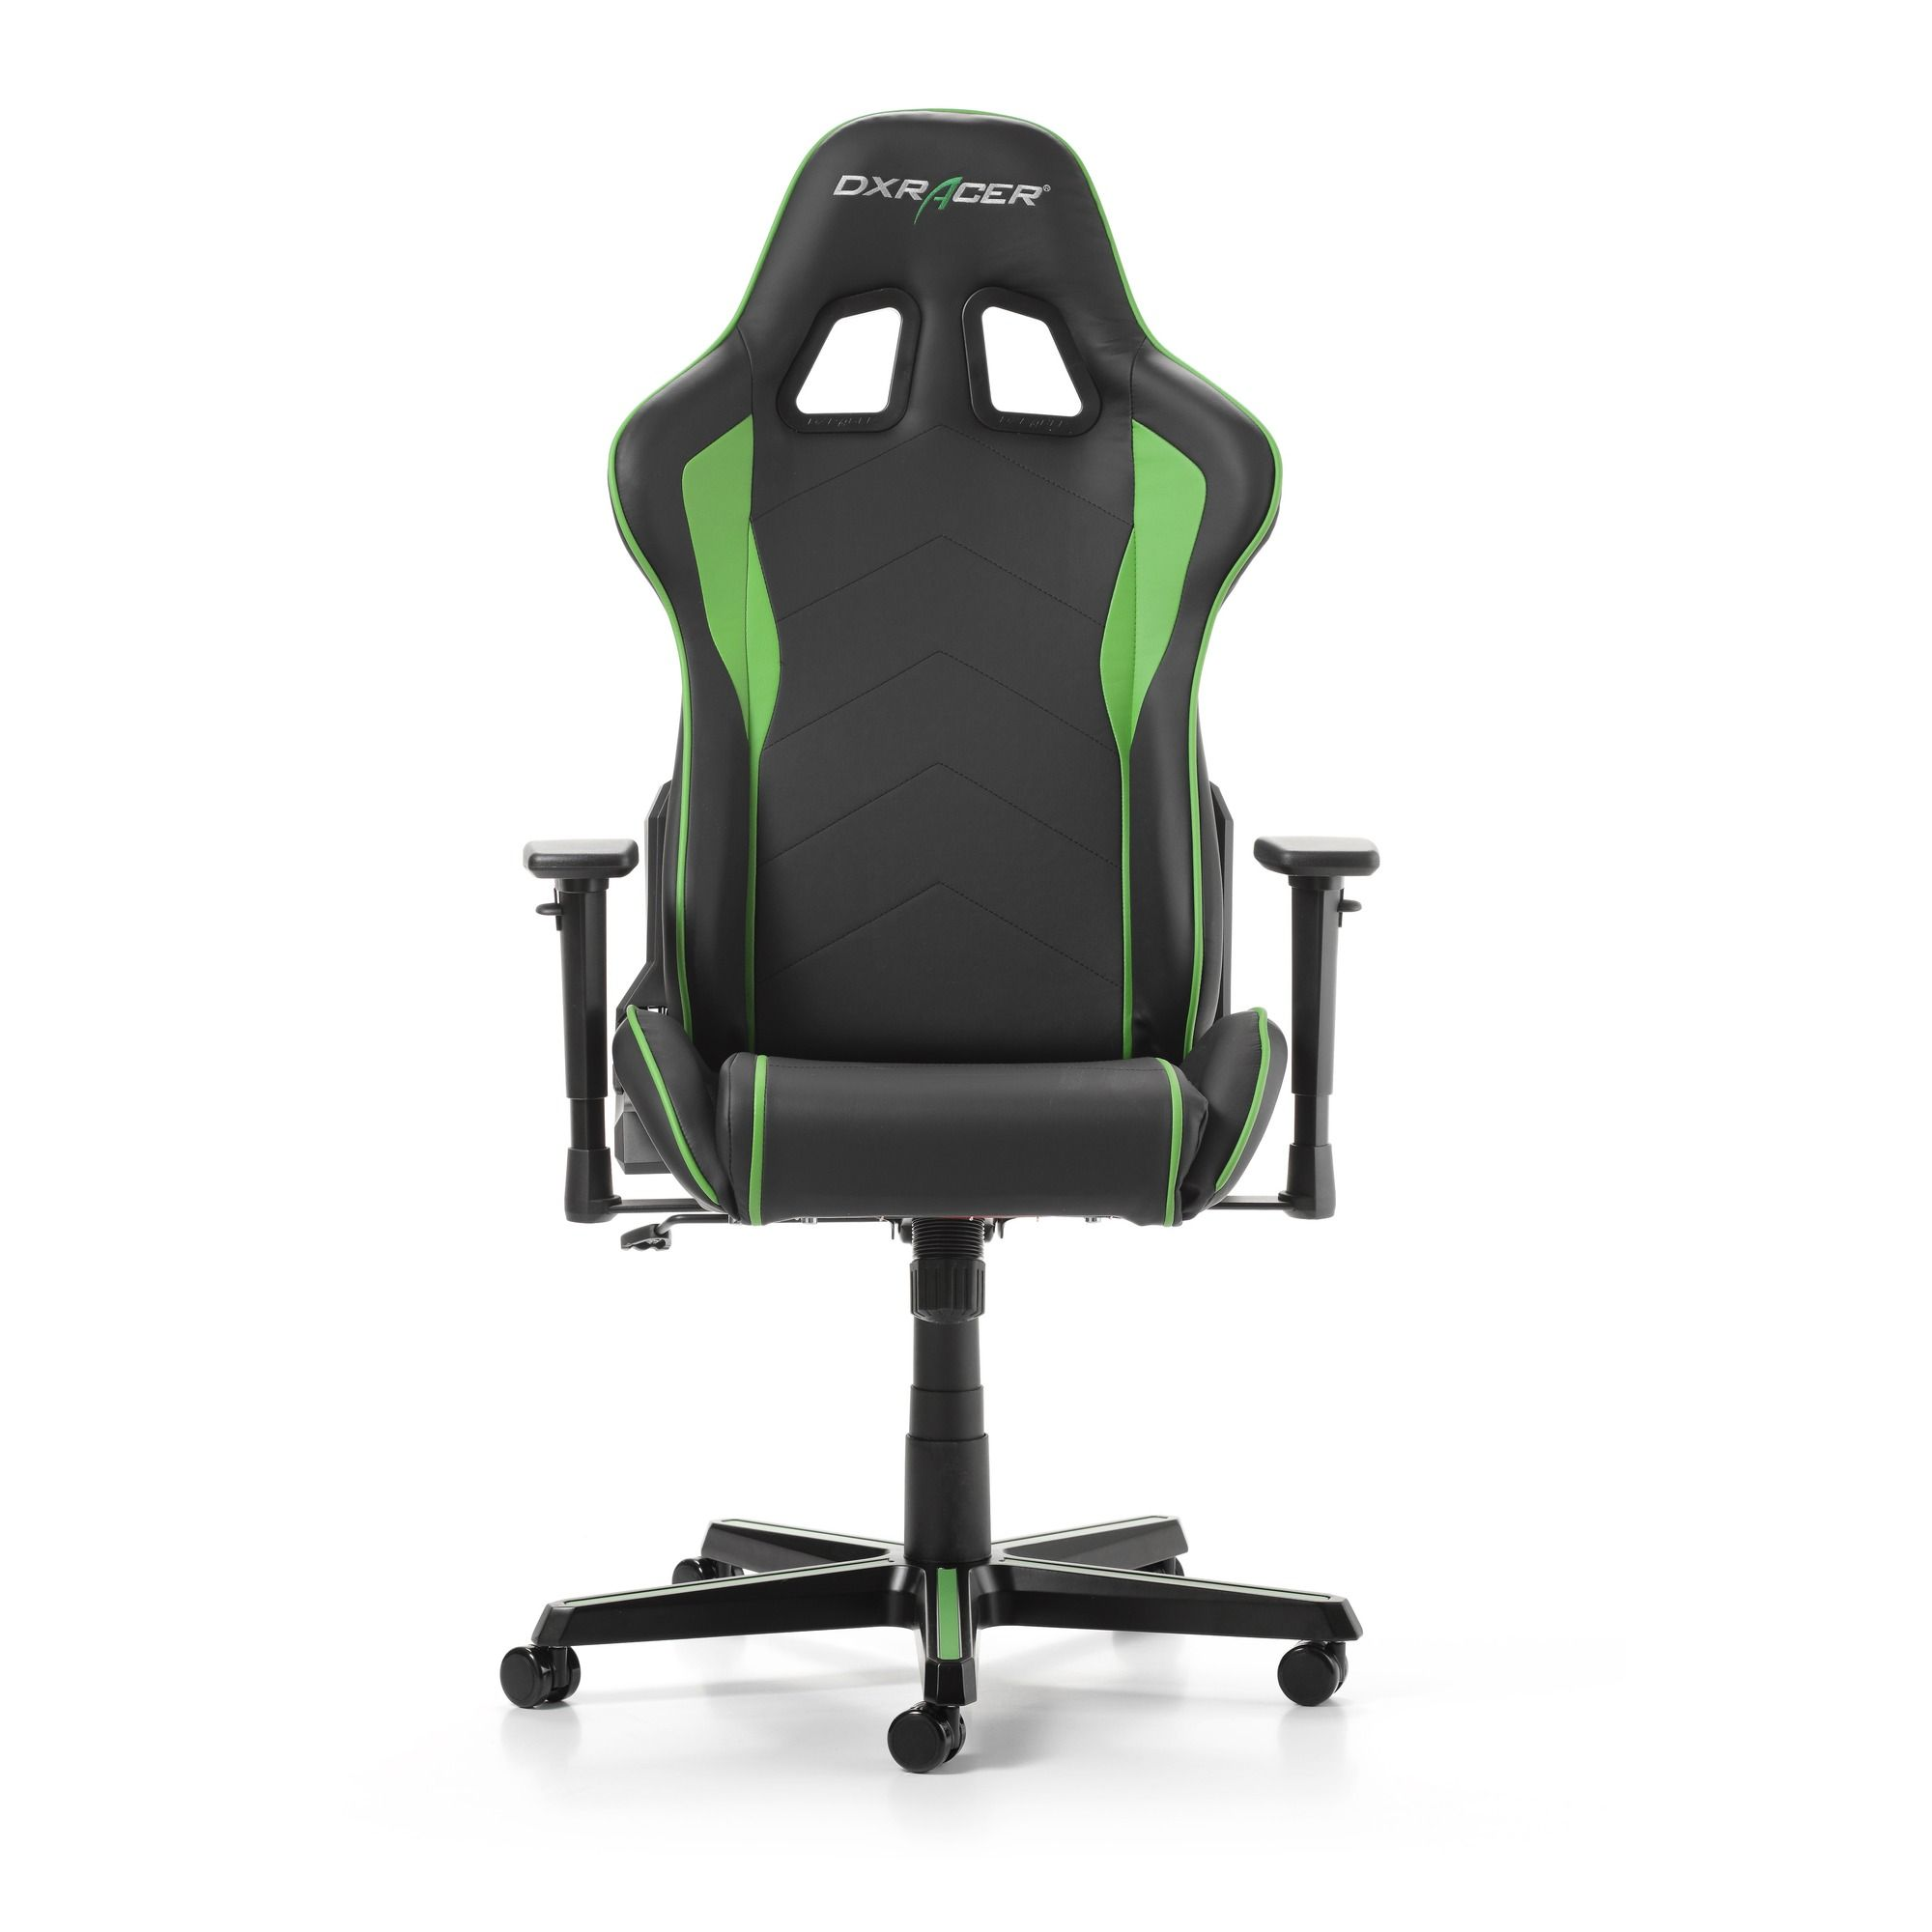 Геймърски стол DXRacer - серия FORMULA, черен/зелен - OH/FH08/NE - 7